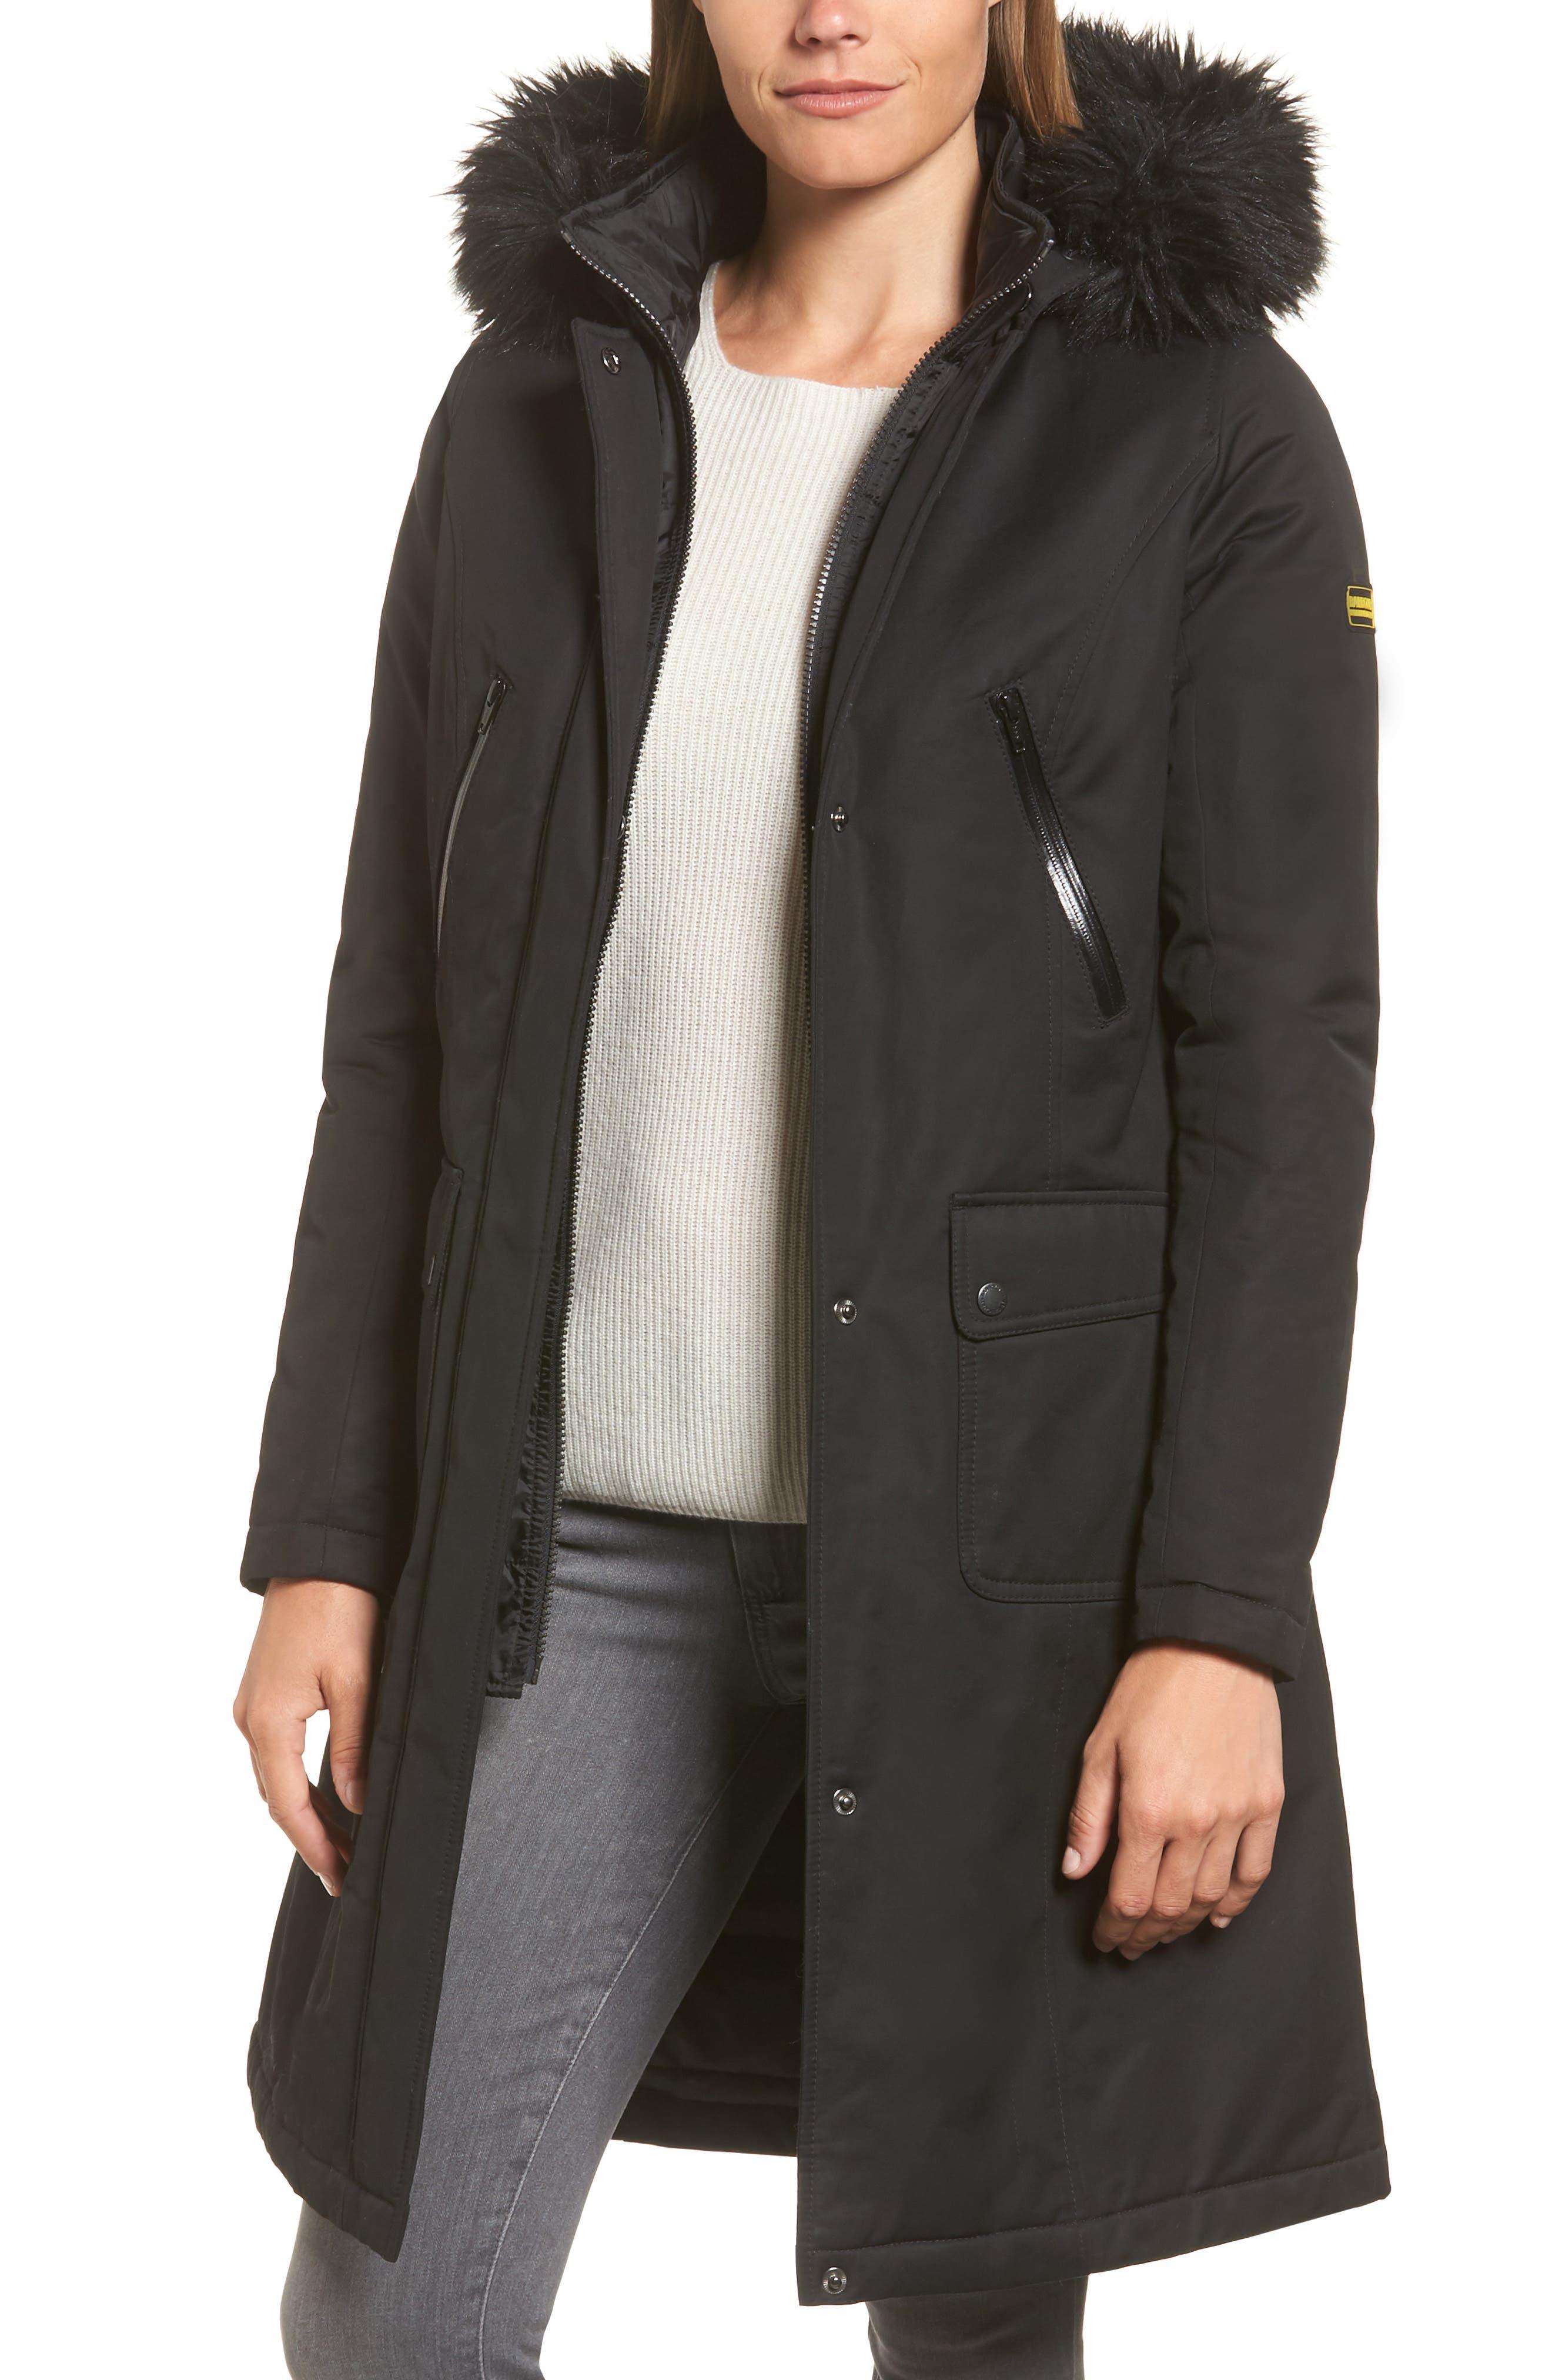 Mondello Hooded Water Resistant Jacket with Faux Fur Trim,                         Main,                         color, Black